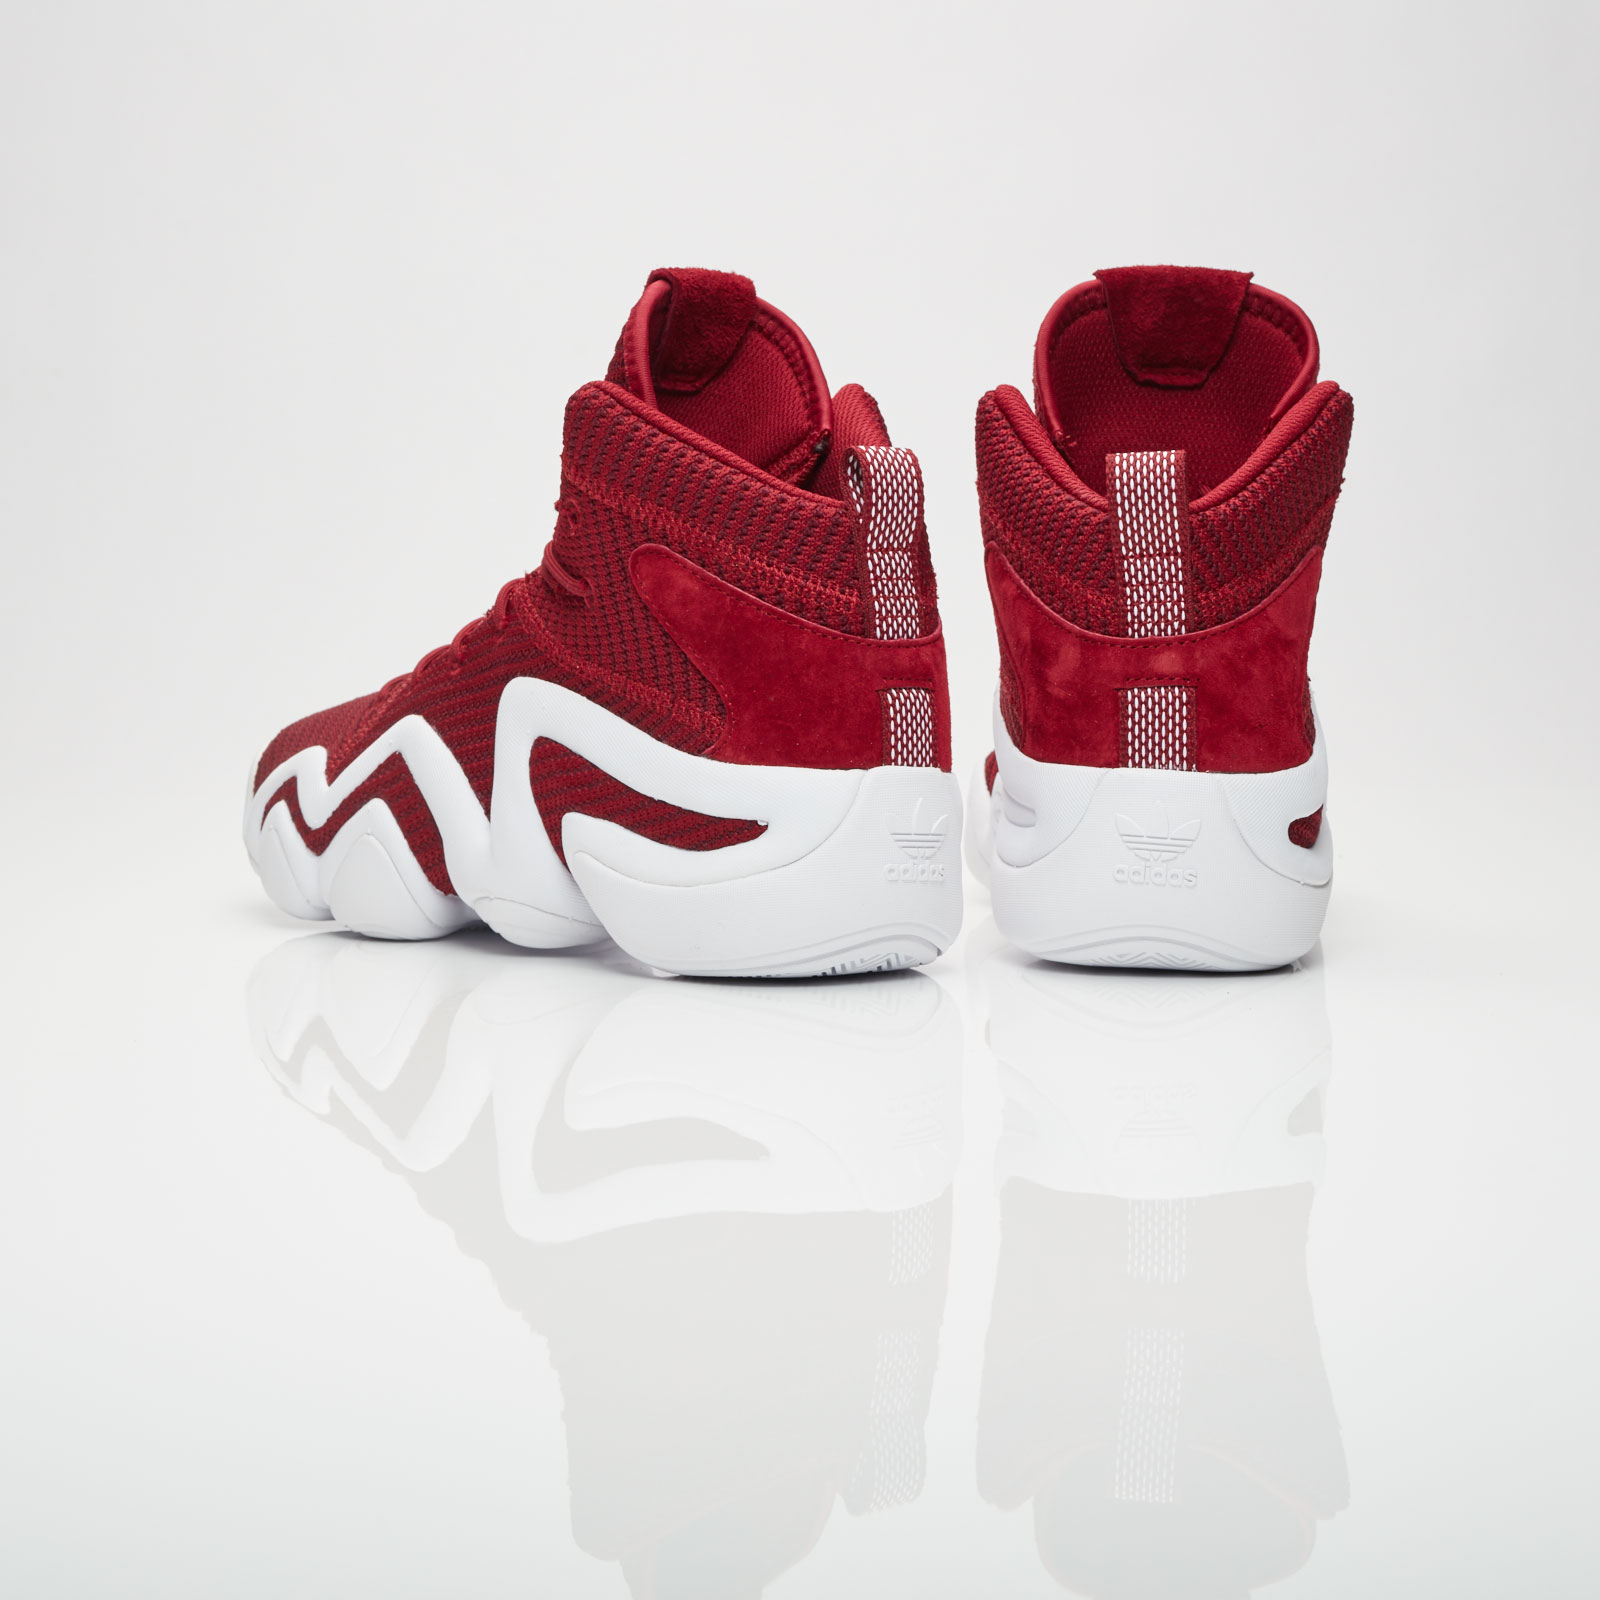 A The Primeknit Gets 8 Upgrade Weartesters Adidas Crazy 0w8vmNn